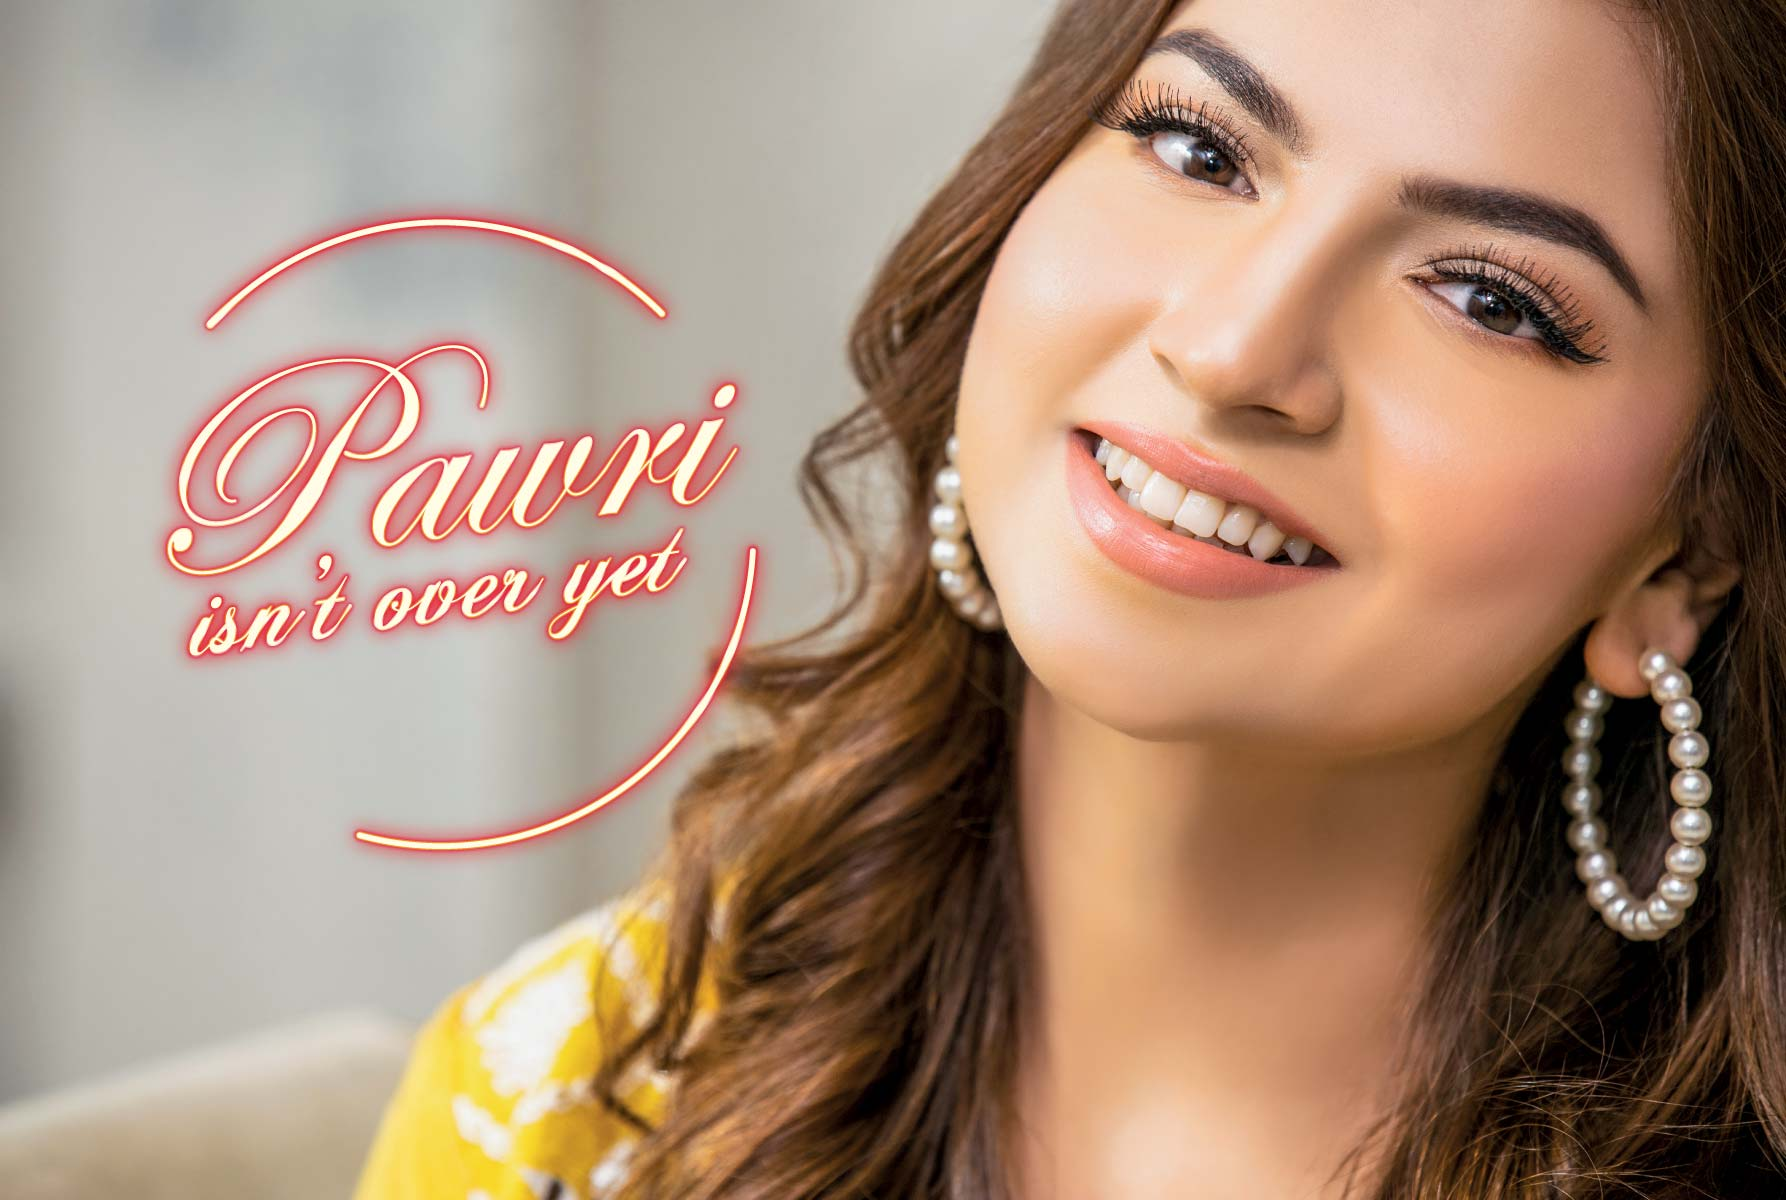 pawri ho rahi hai girl Dananeer exclusive photo shoot